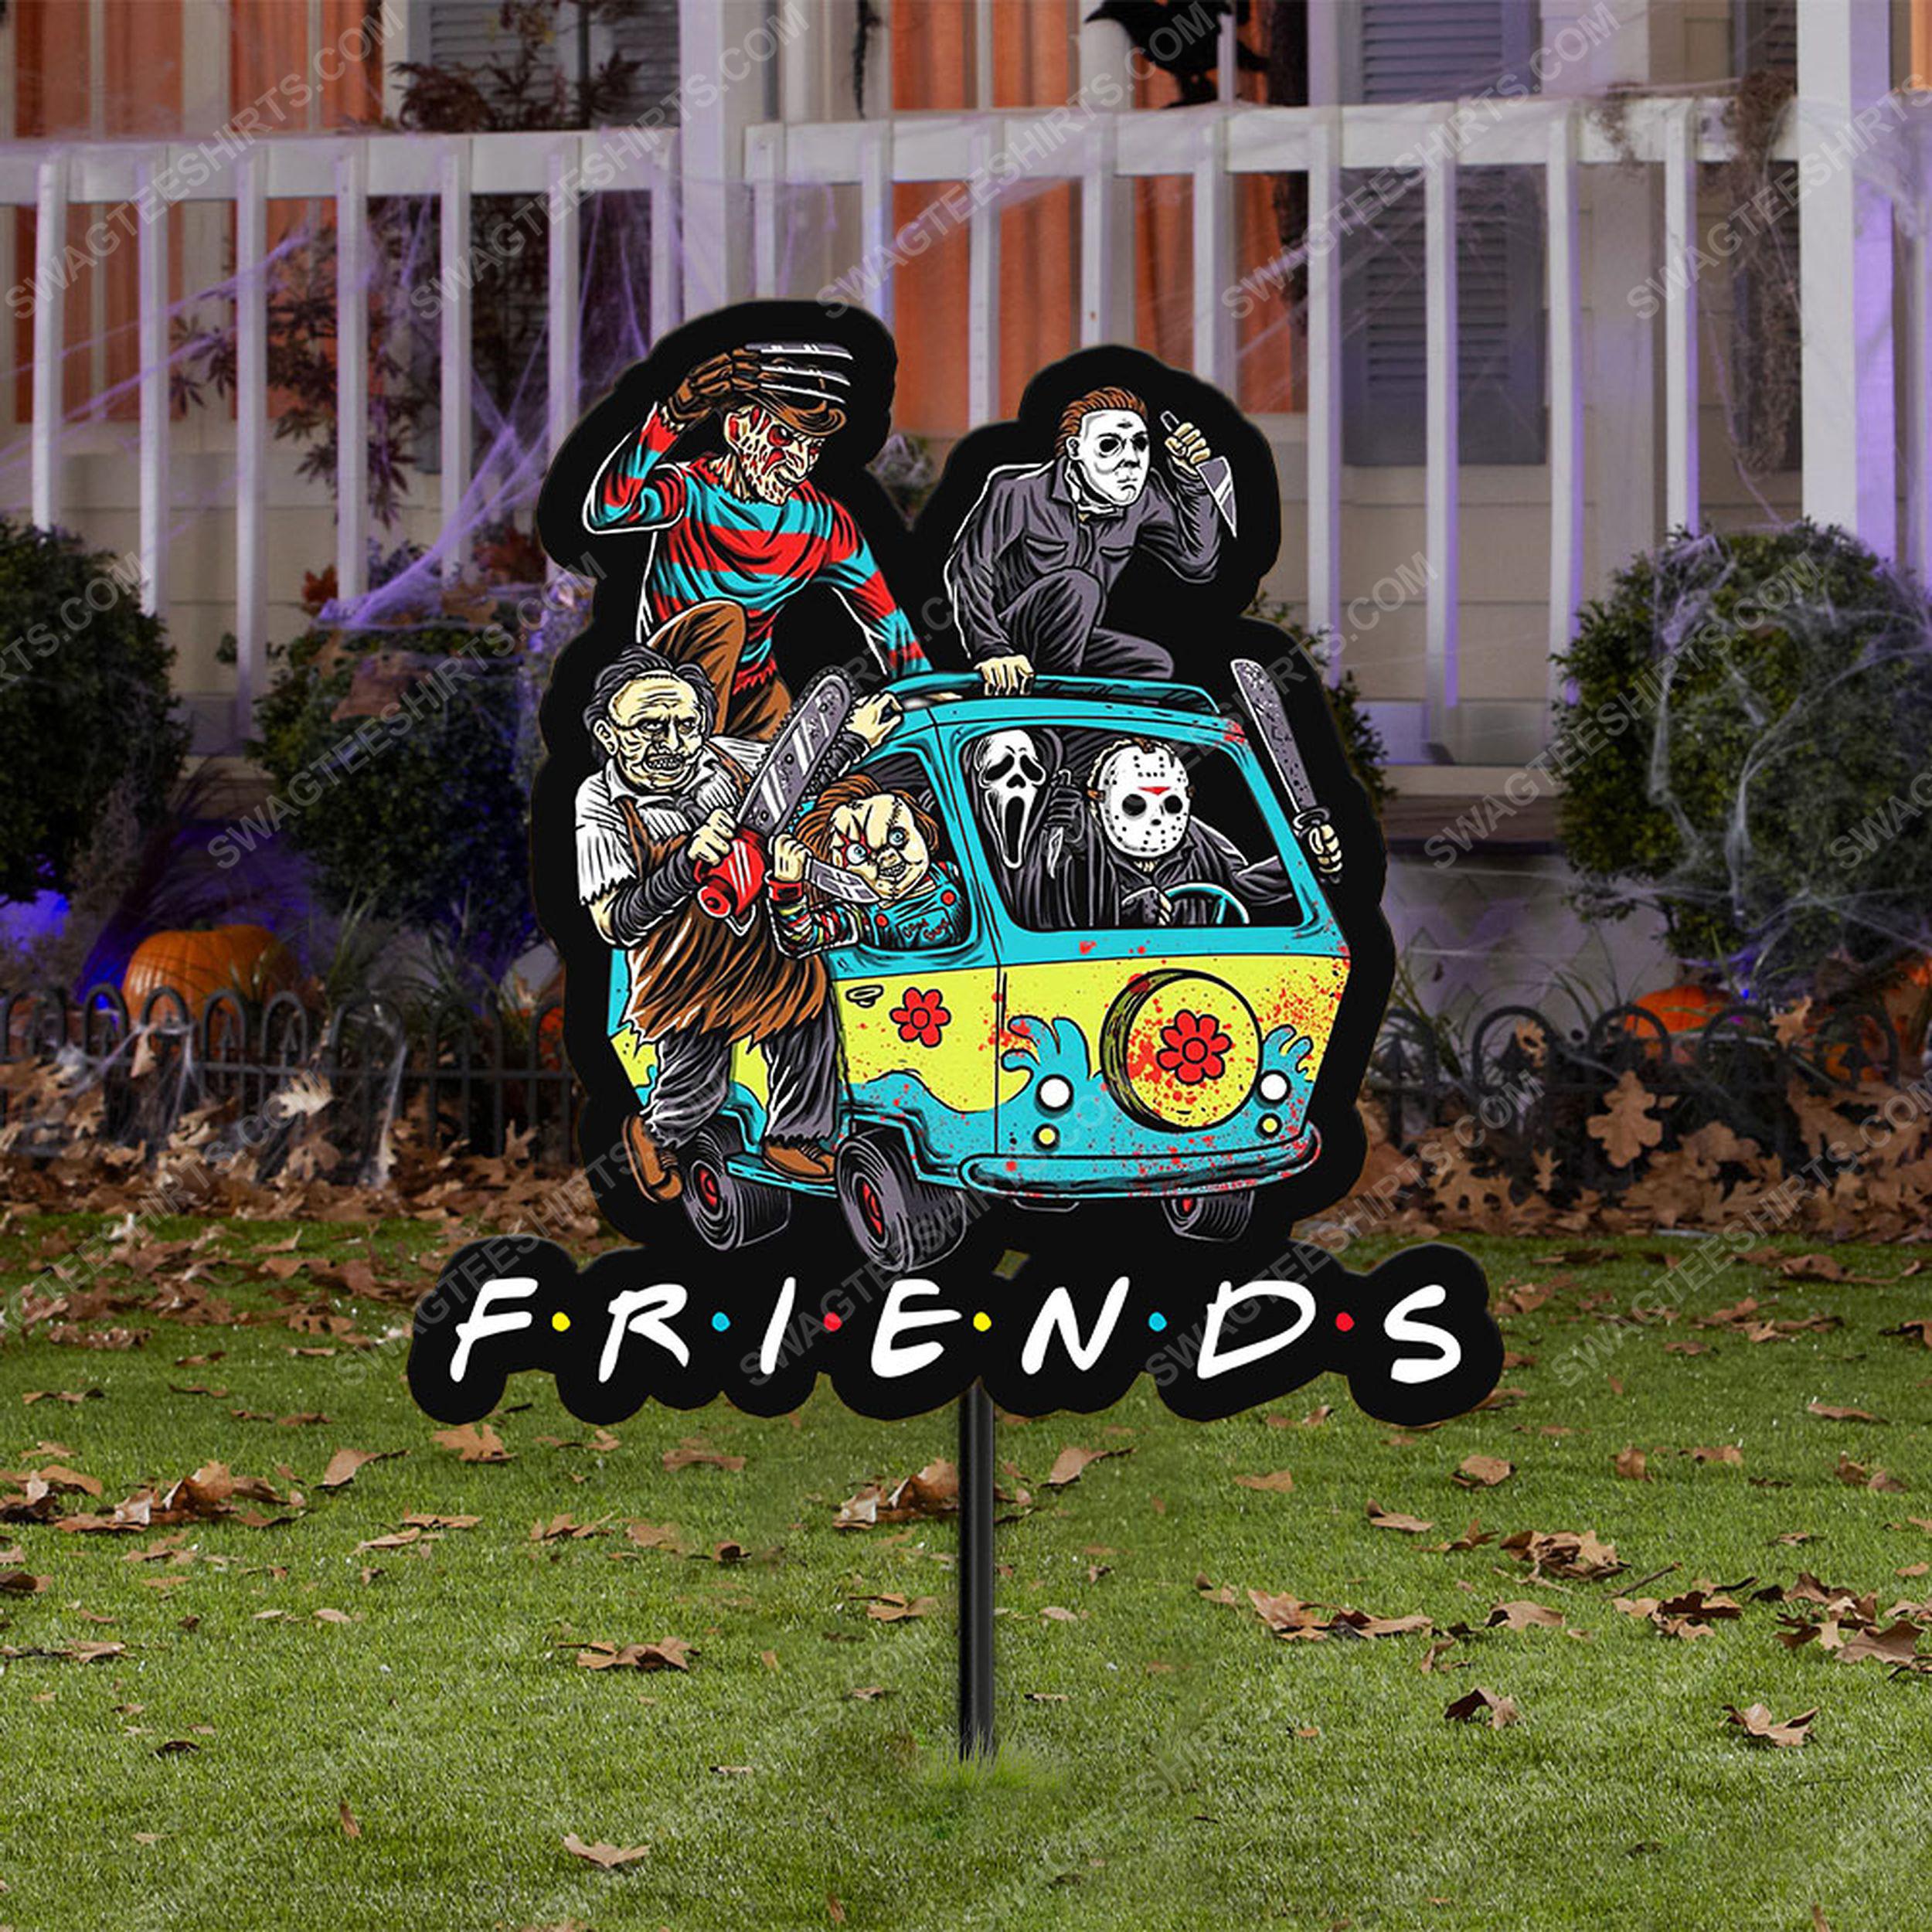 Halloween horror movie villains friends yard sign 2(1)